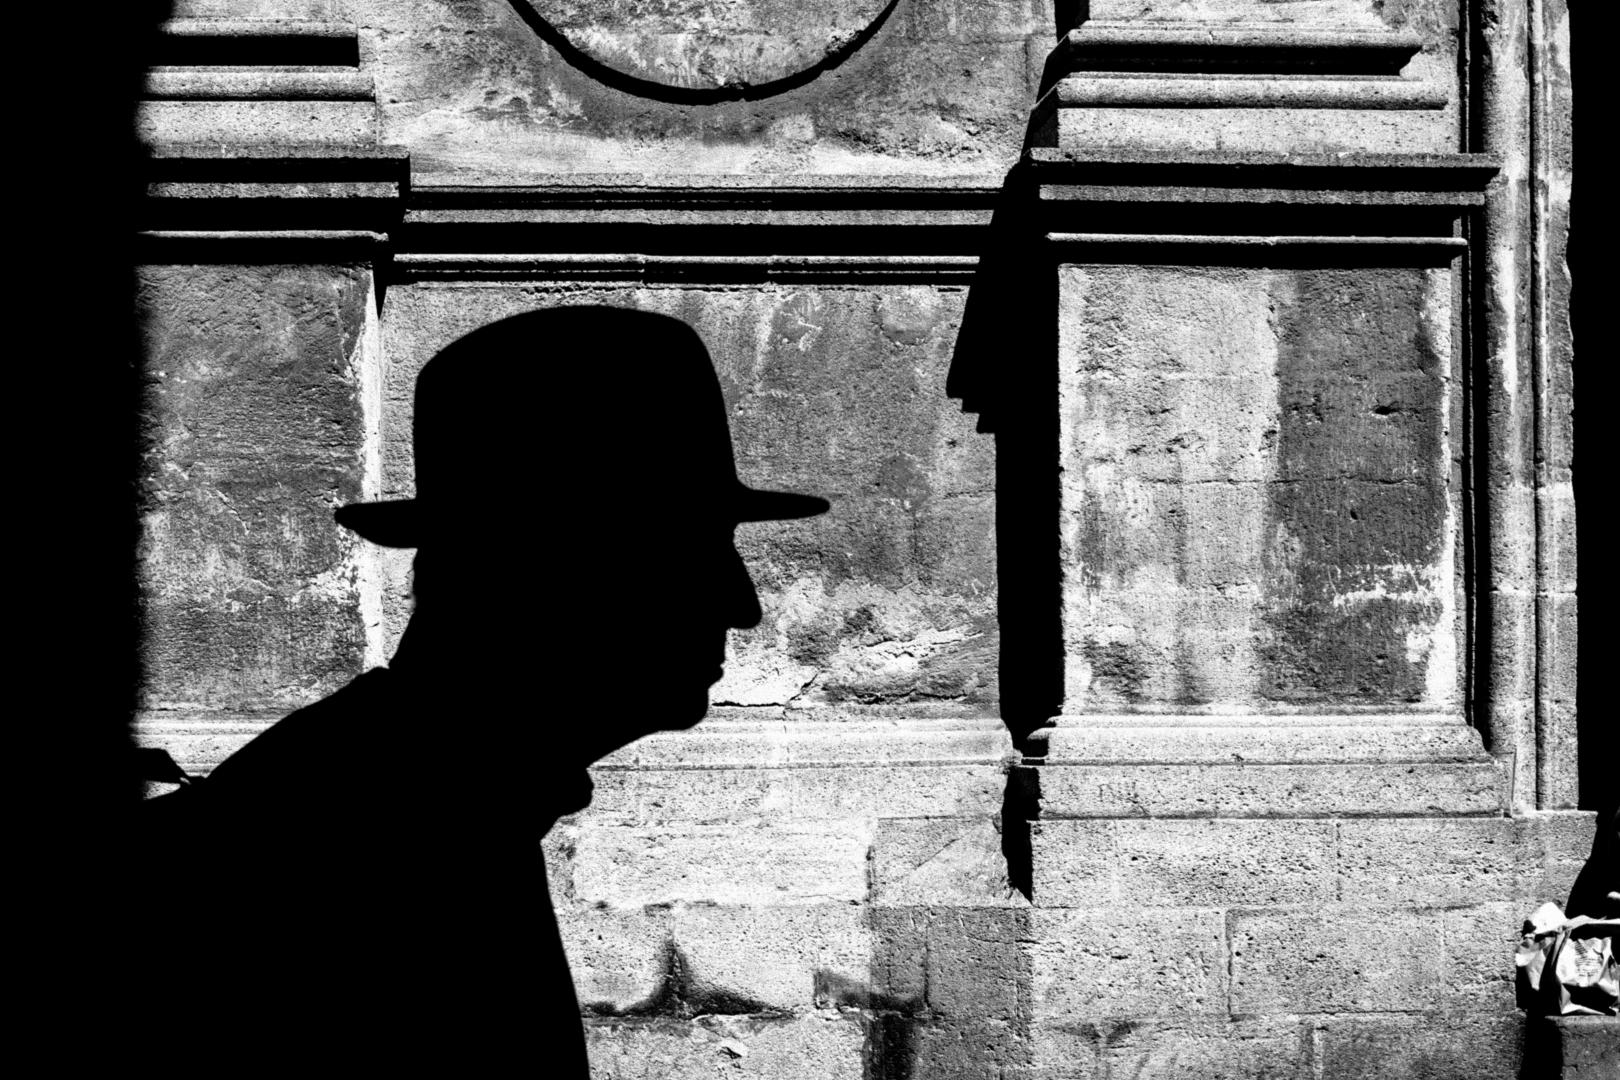 jeff-chane-mouye-street-photography-Aix-en-Provence-193